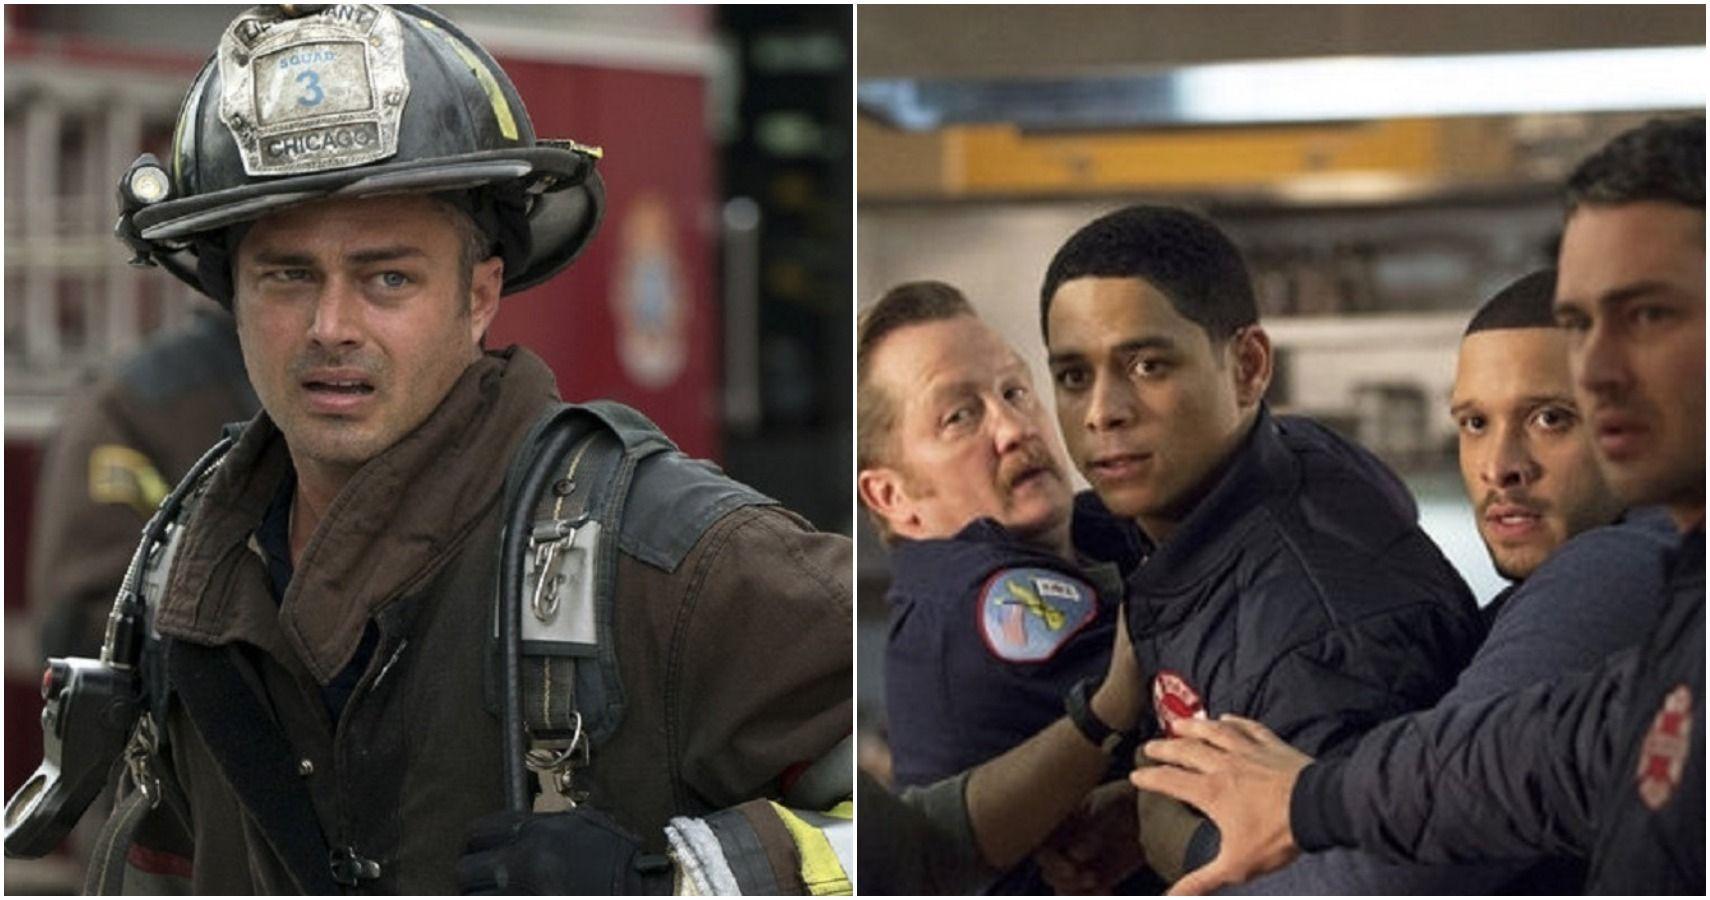 Chicago Fire 10 Worst Episodes According To Imdb Screenrant